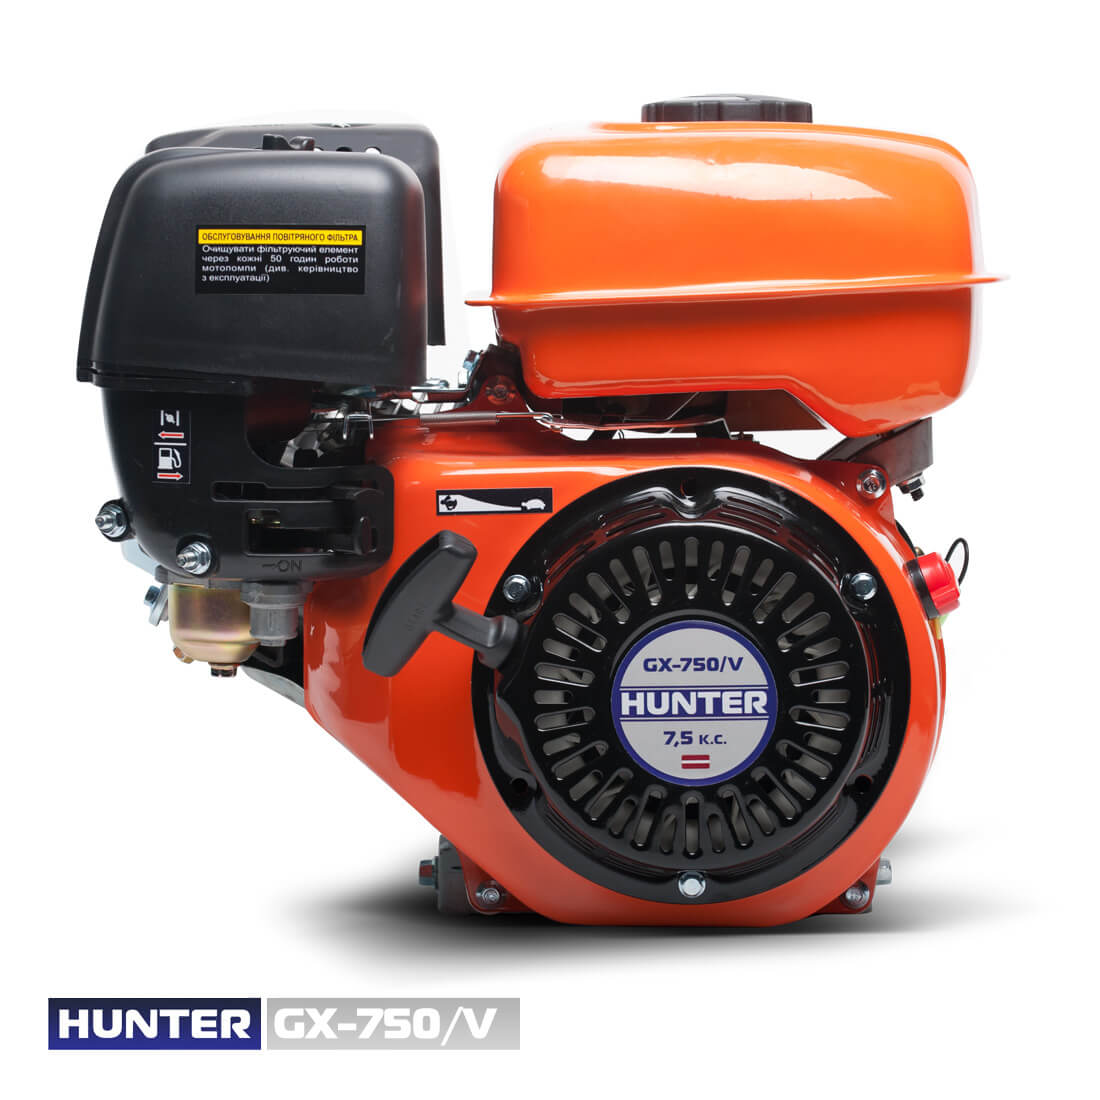 Фото GX-750/V цена 5000грн №2 — Hunter